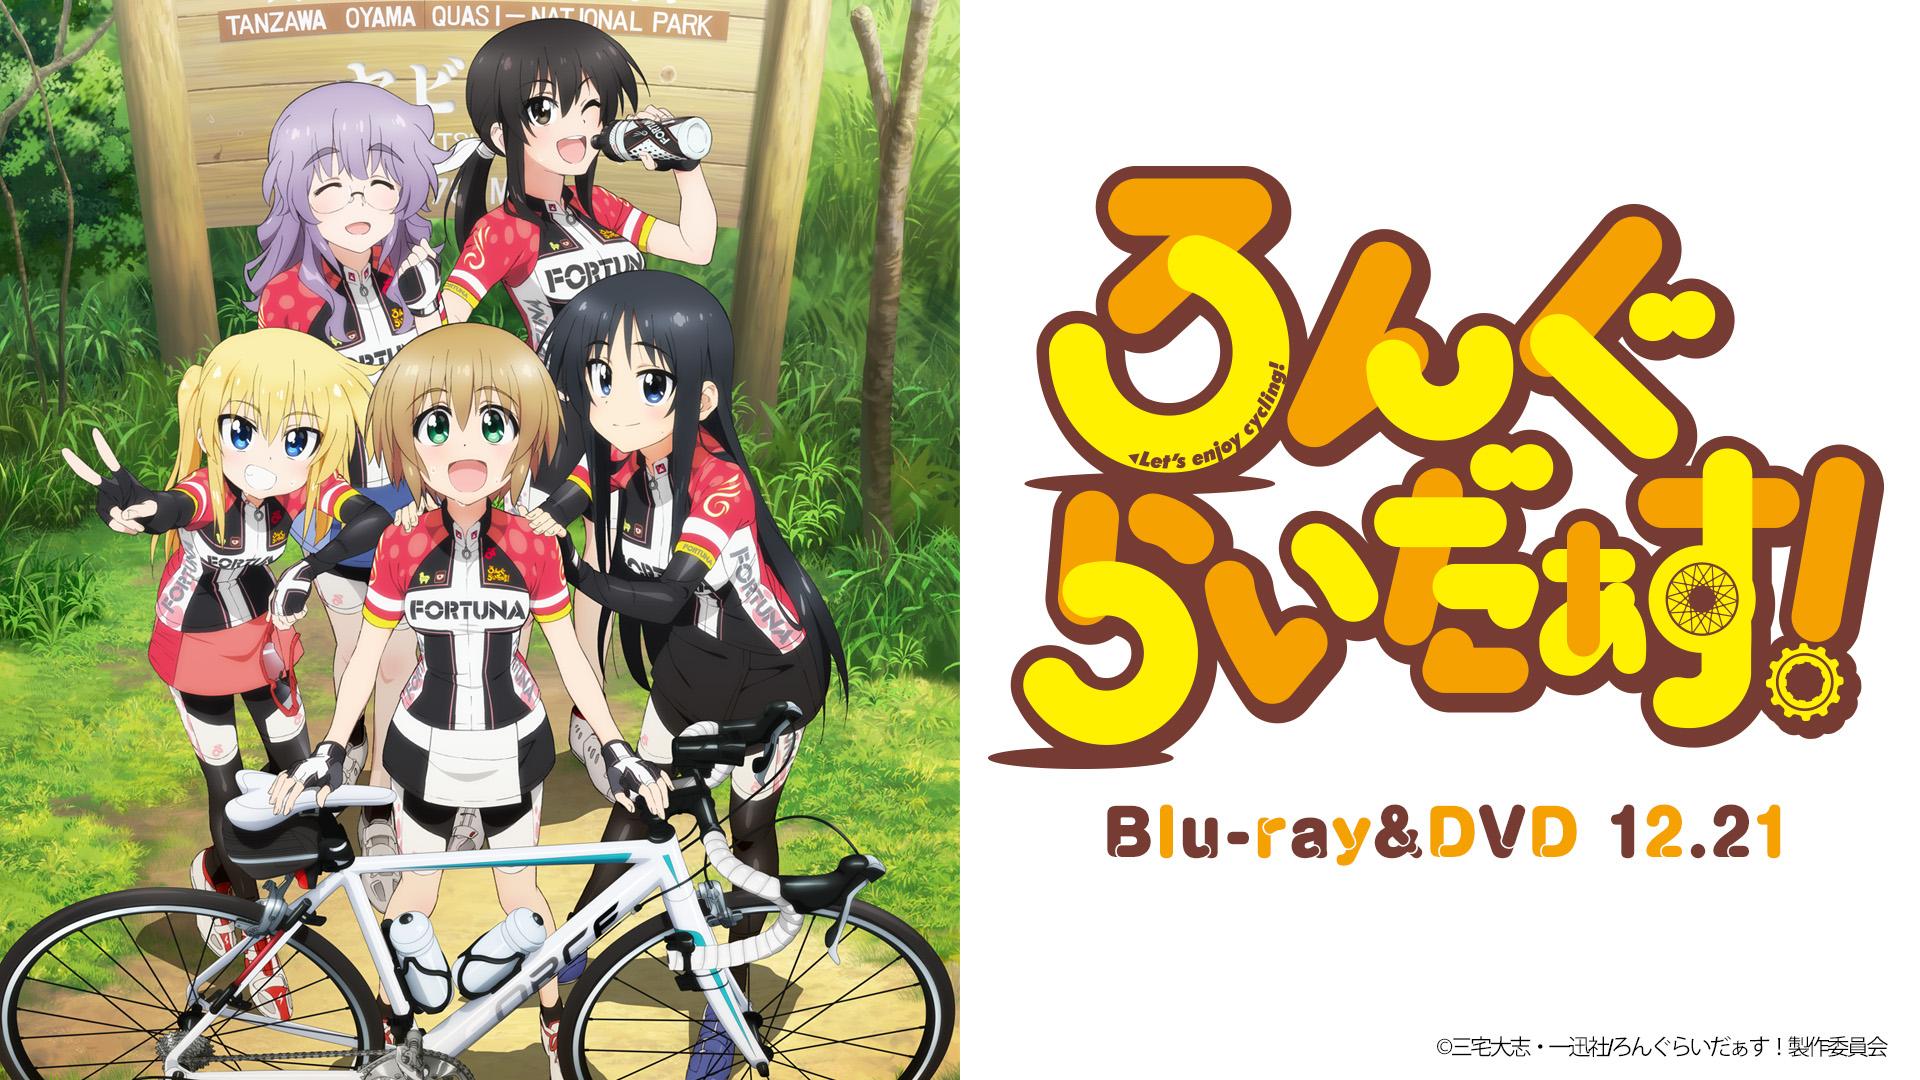 Special Tvアニメ ろんぐらいだぁす 公式サイト